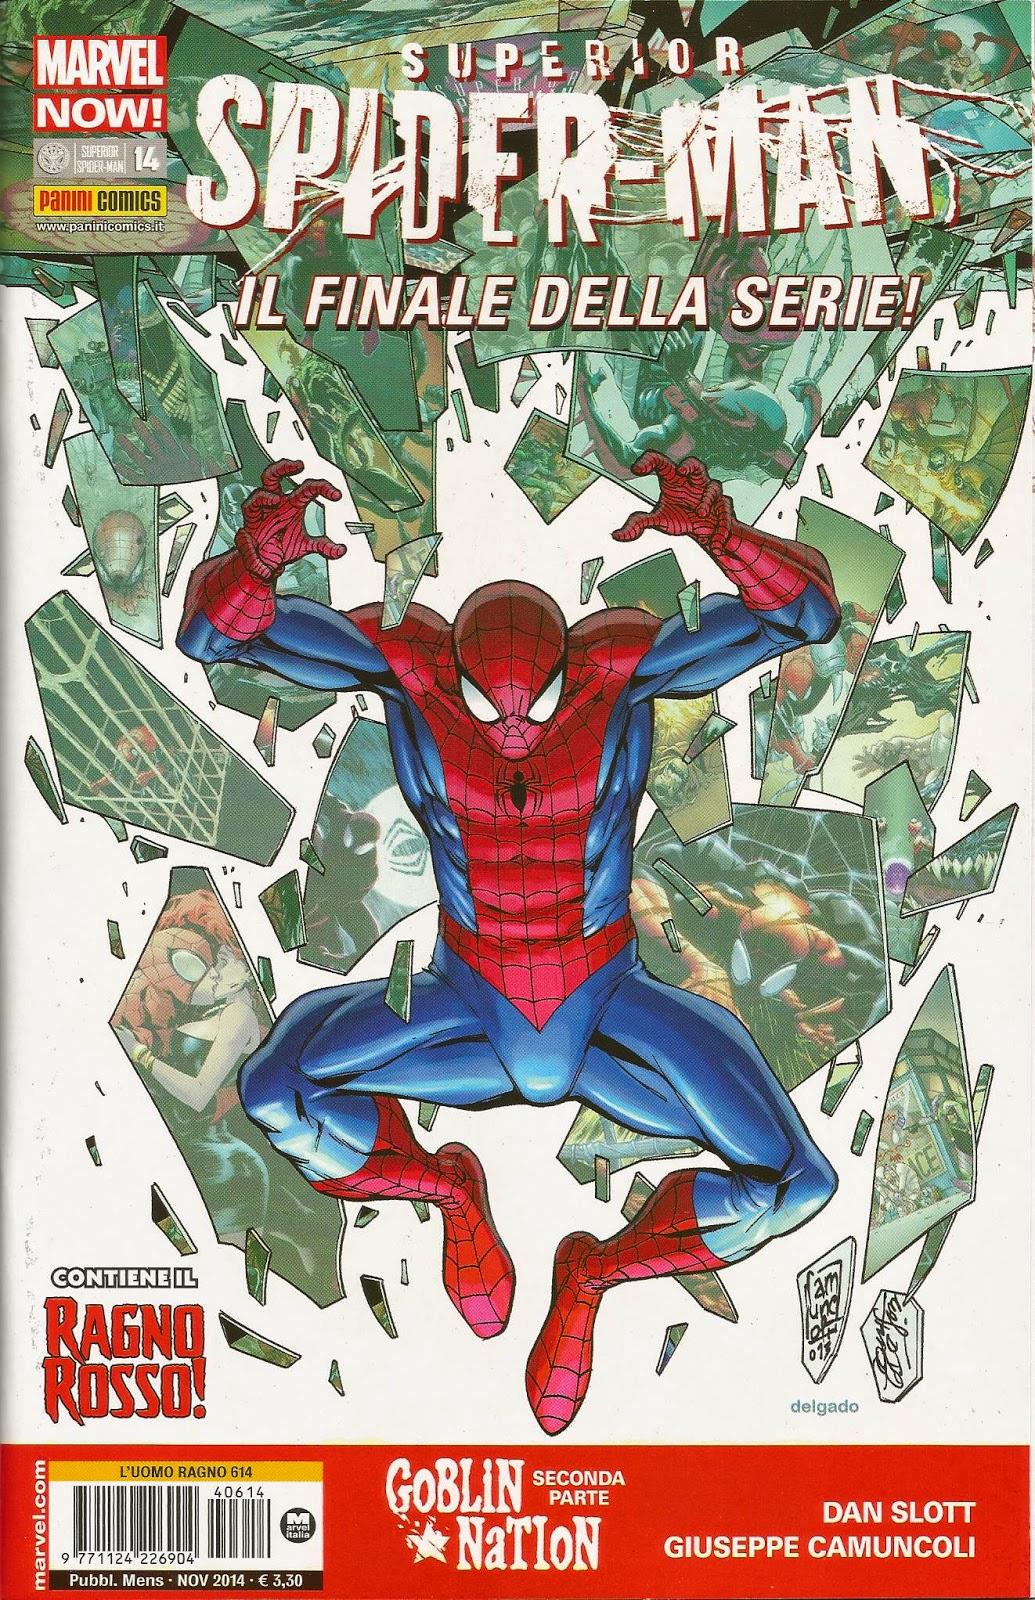 Spider-Man PANINI hobgoblin vive L'UOMO RAGNO Deluxe #31